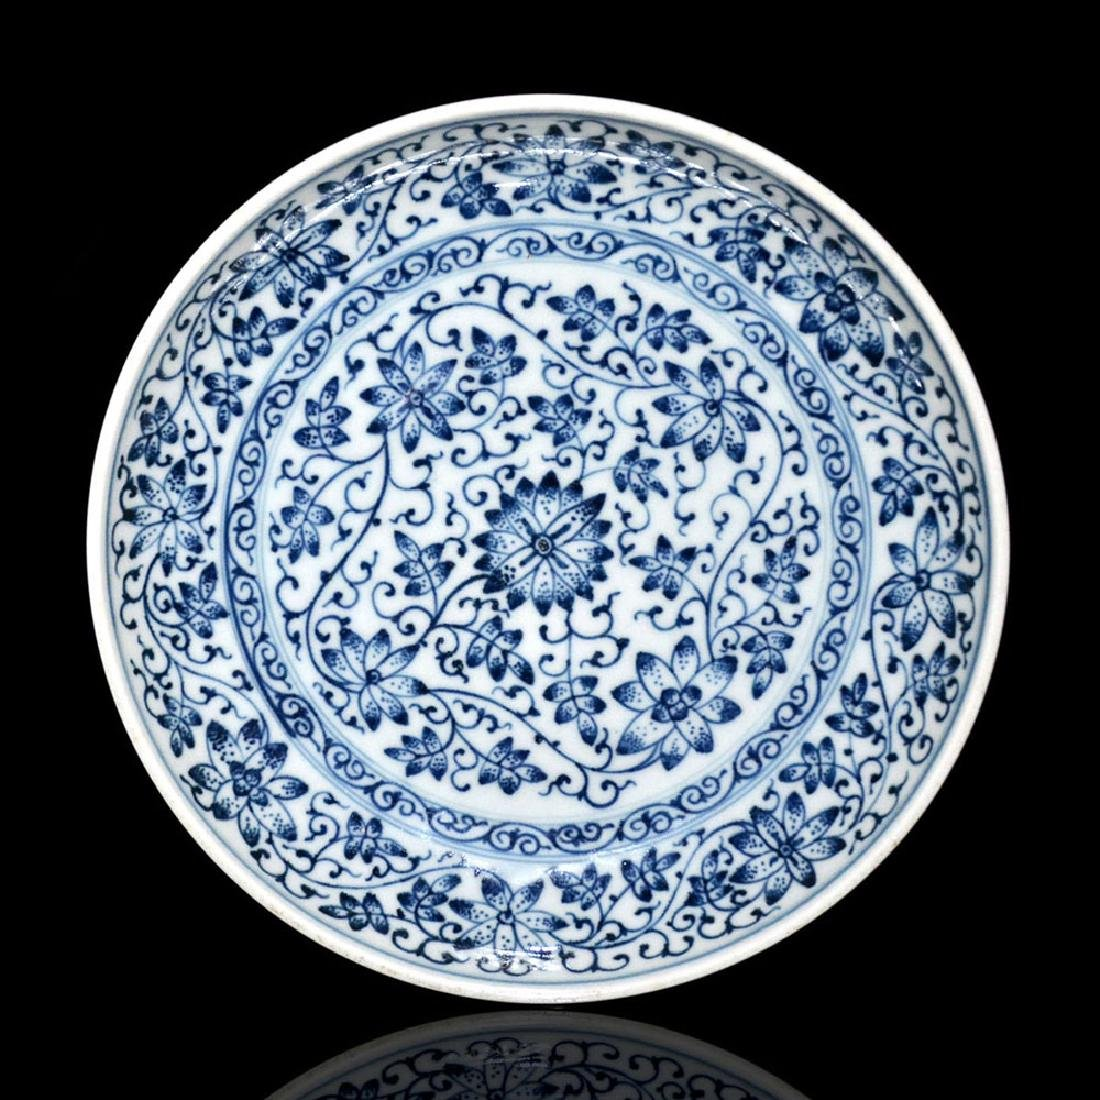 Ming Dynasty, Yongle, Blue and White Interlocking